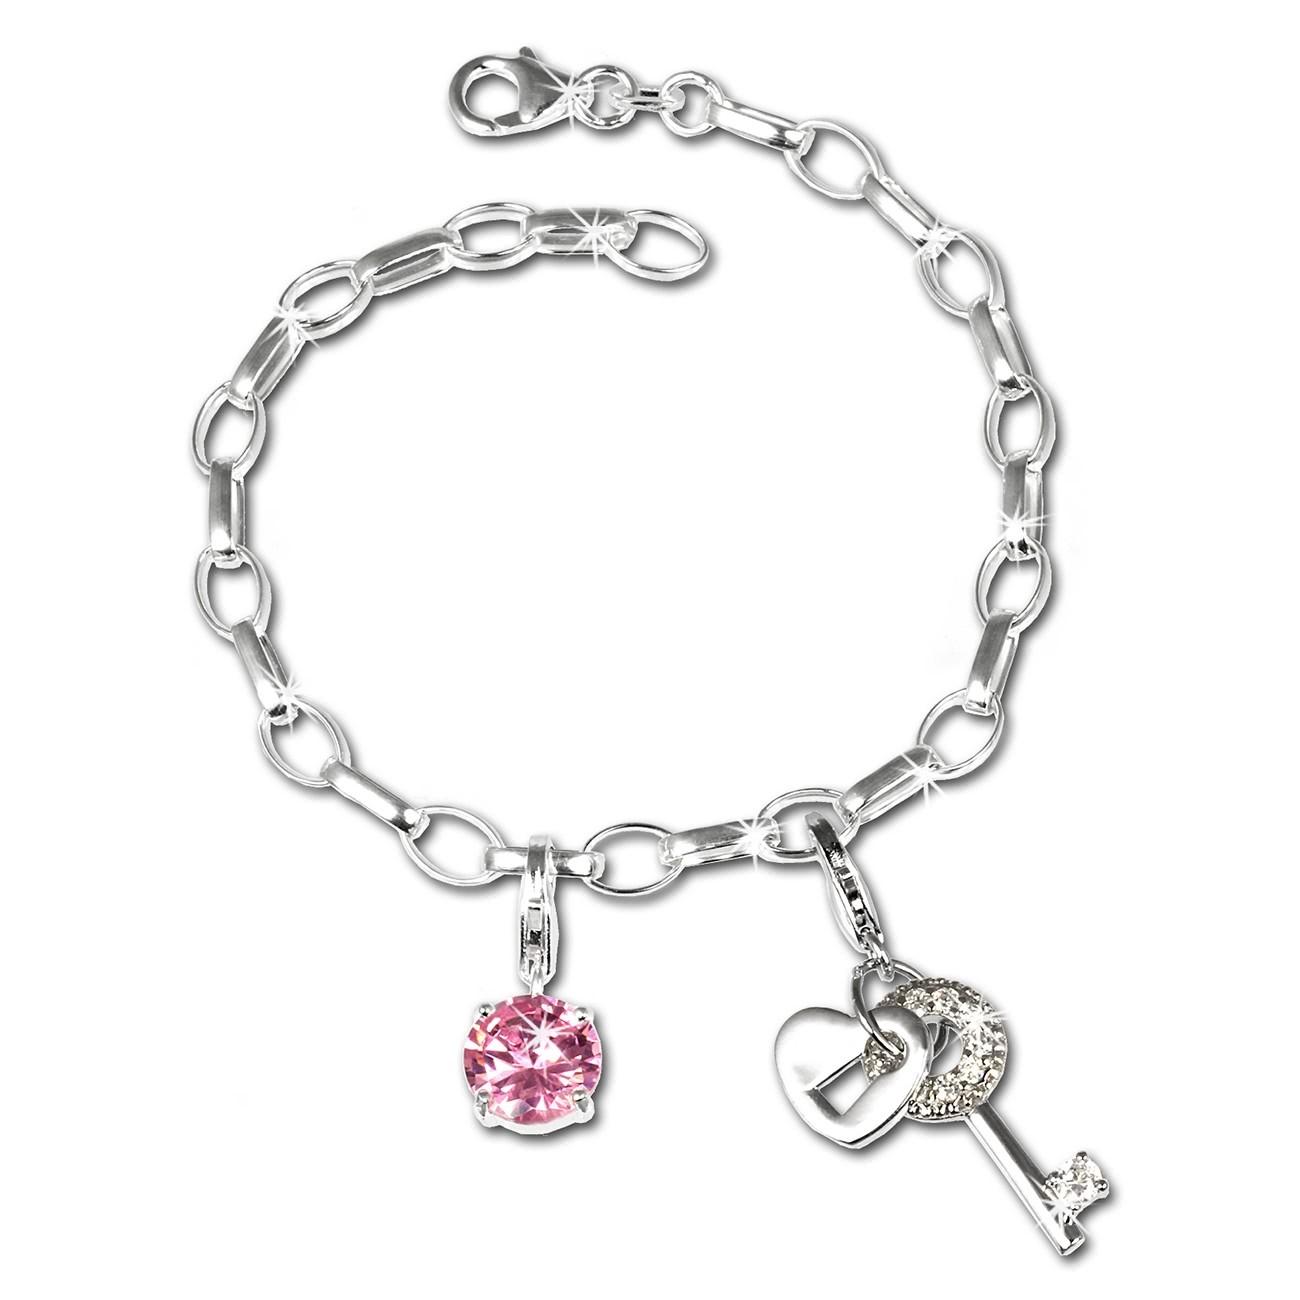 SilberDream Charm Set Schlüssel 925er Silber Armband Anhänger FCA310